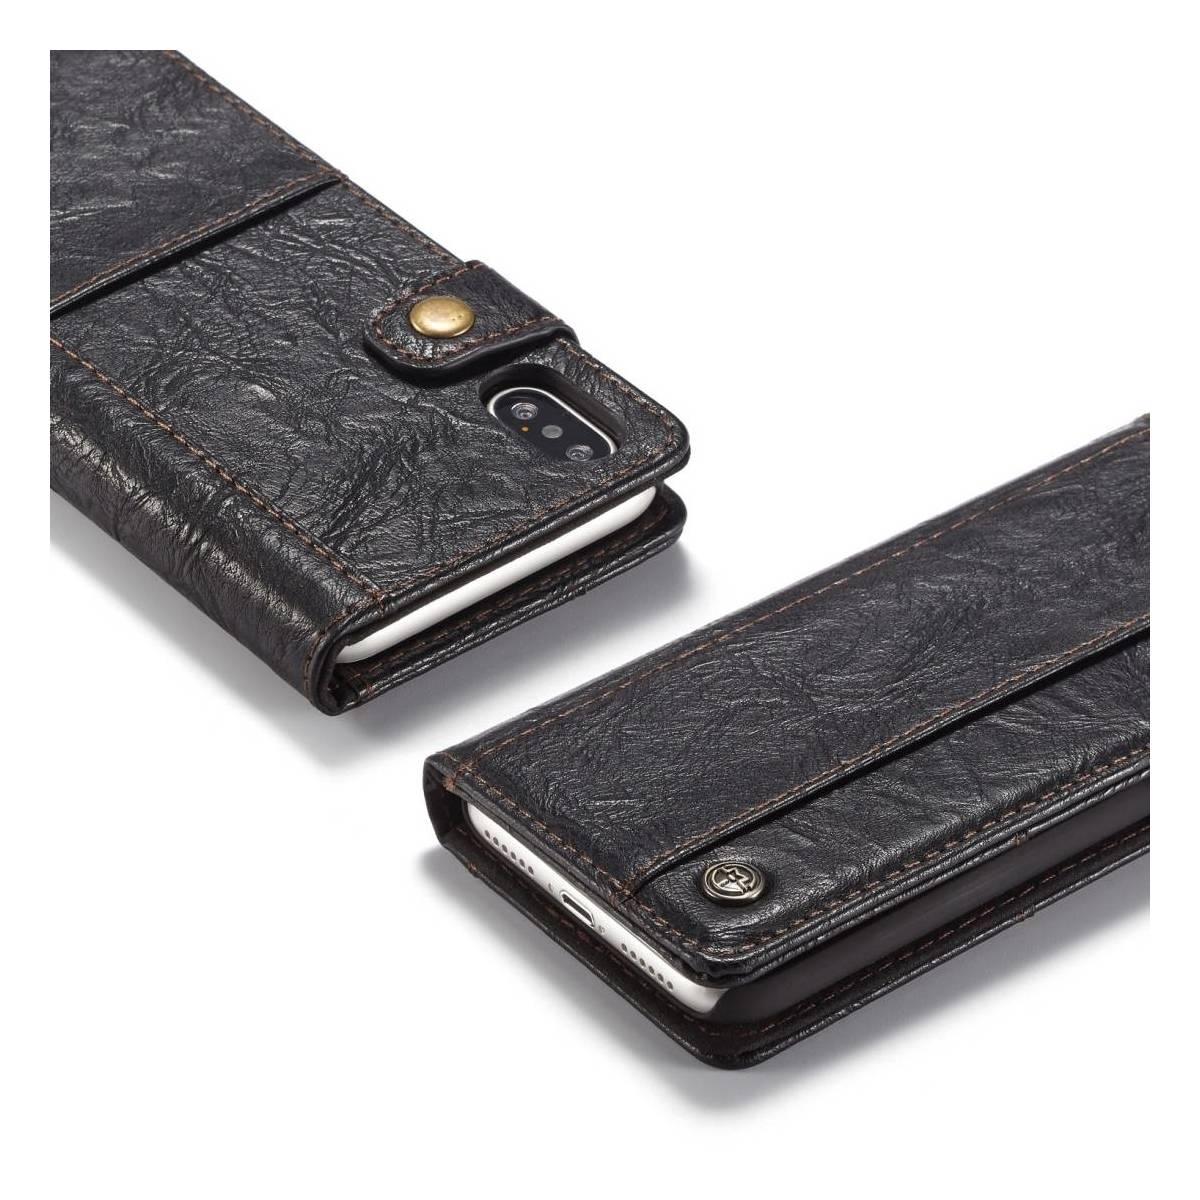 4e1edeafc72 Fedt iPhone læder pung-cover sort/brun t. iPhone X/Xs - MacKabler.dk